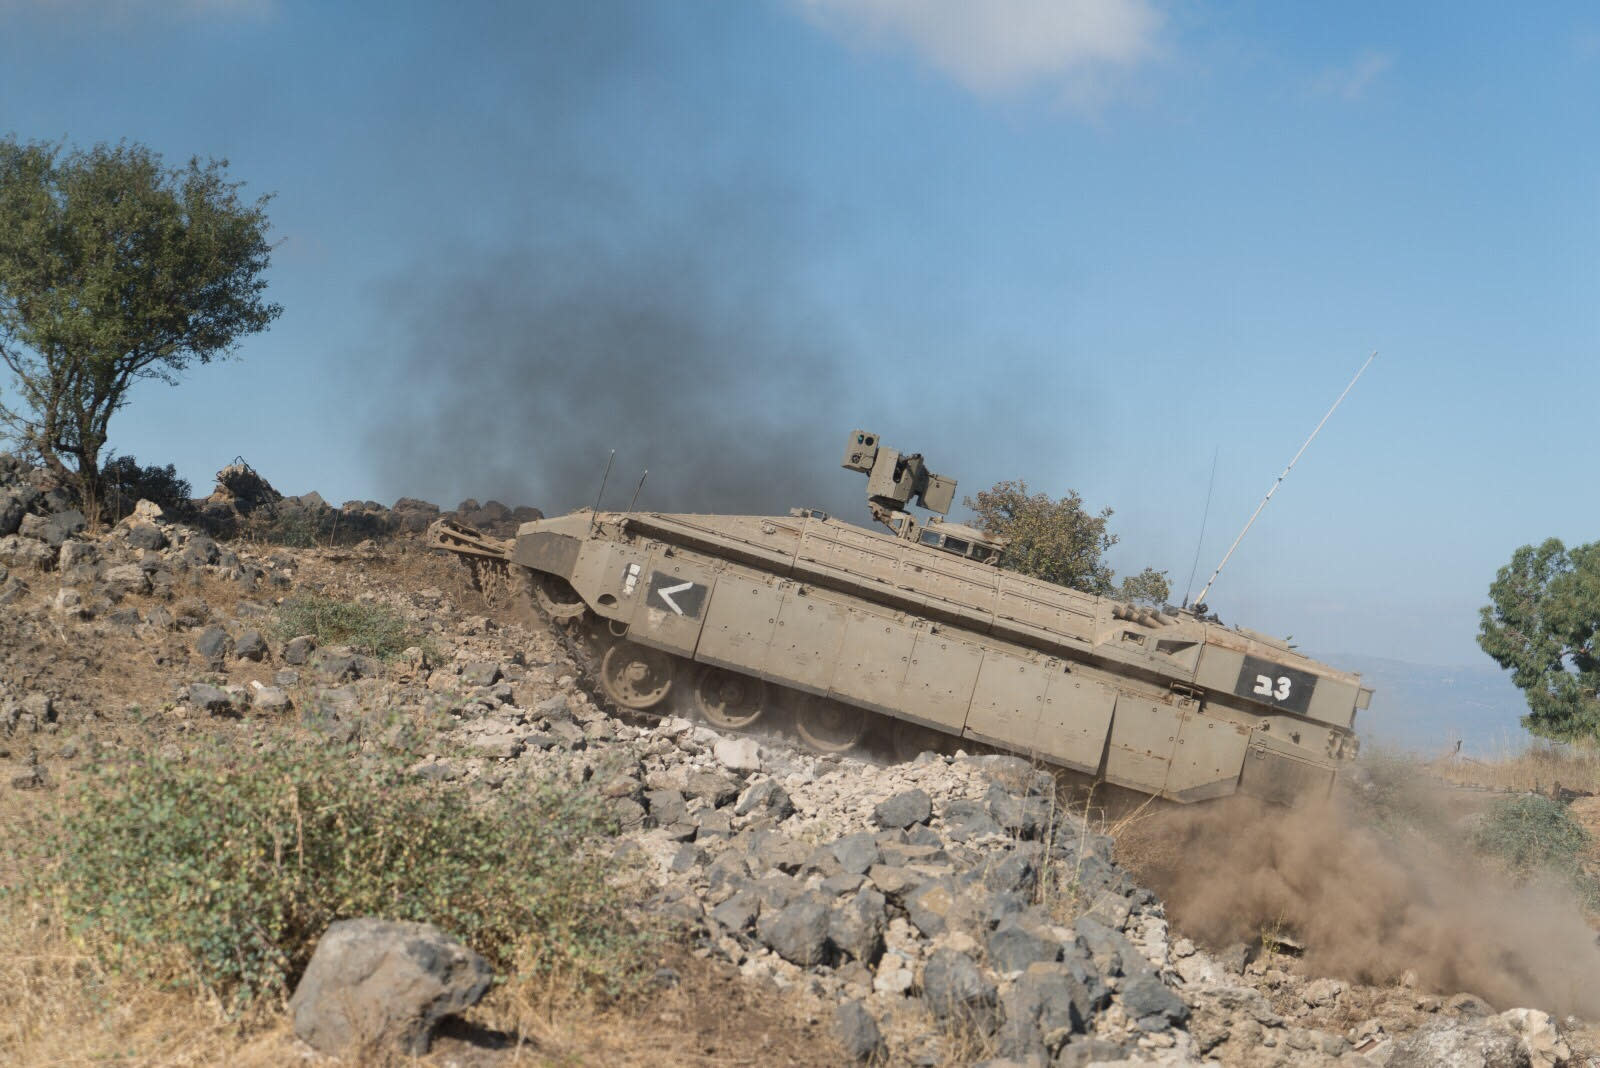 A Namer APC shows off its abilities at traversing steep terrain (IDF Spokesperson't Unit)